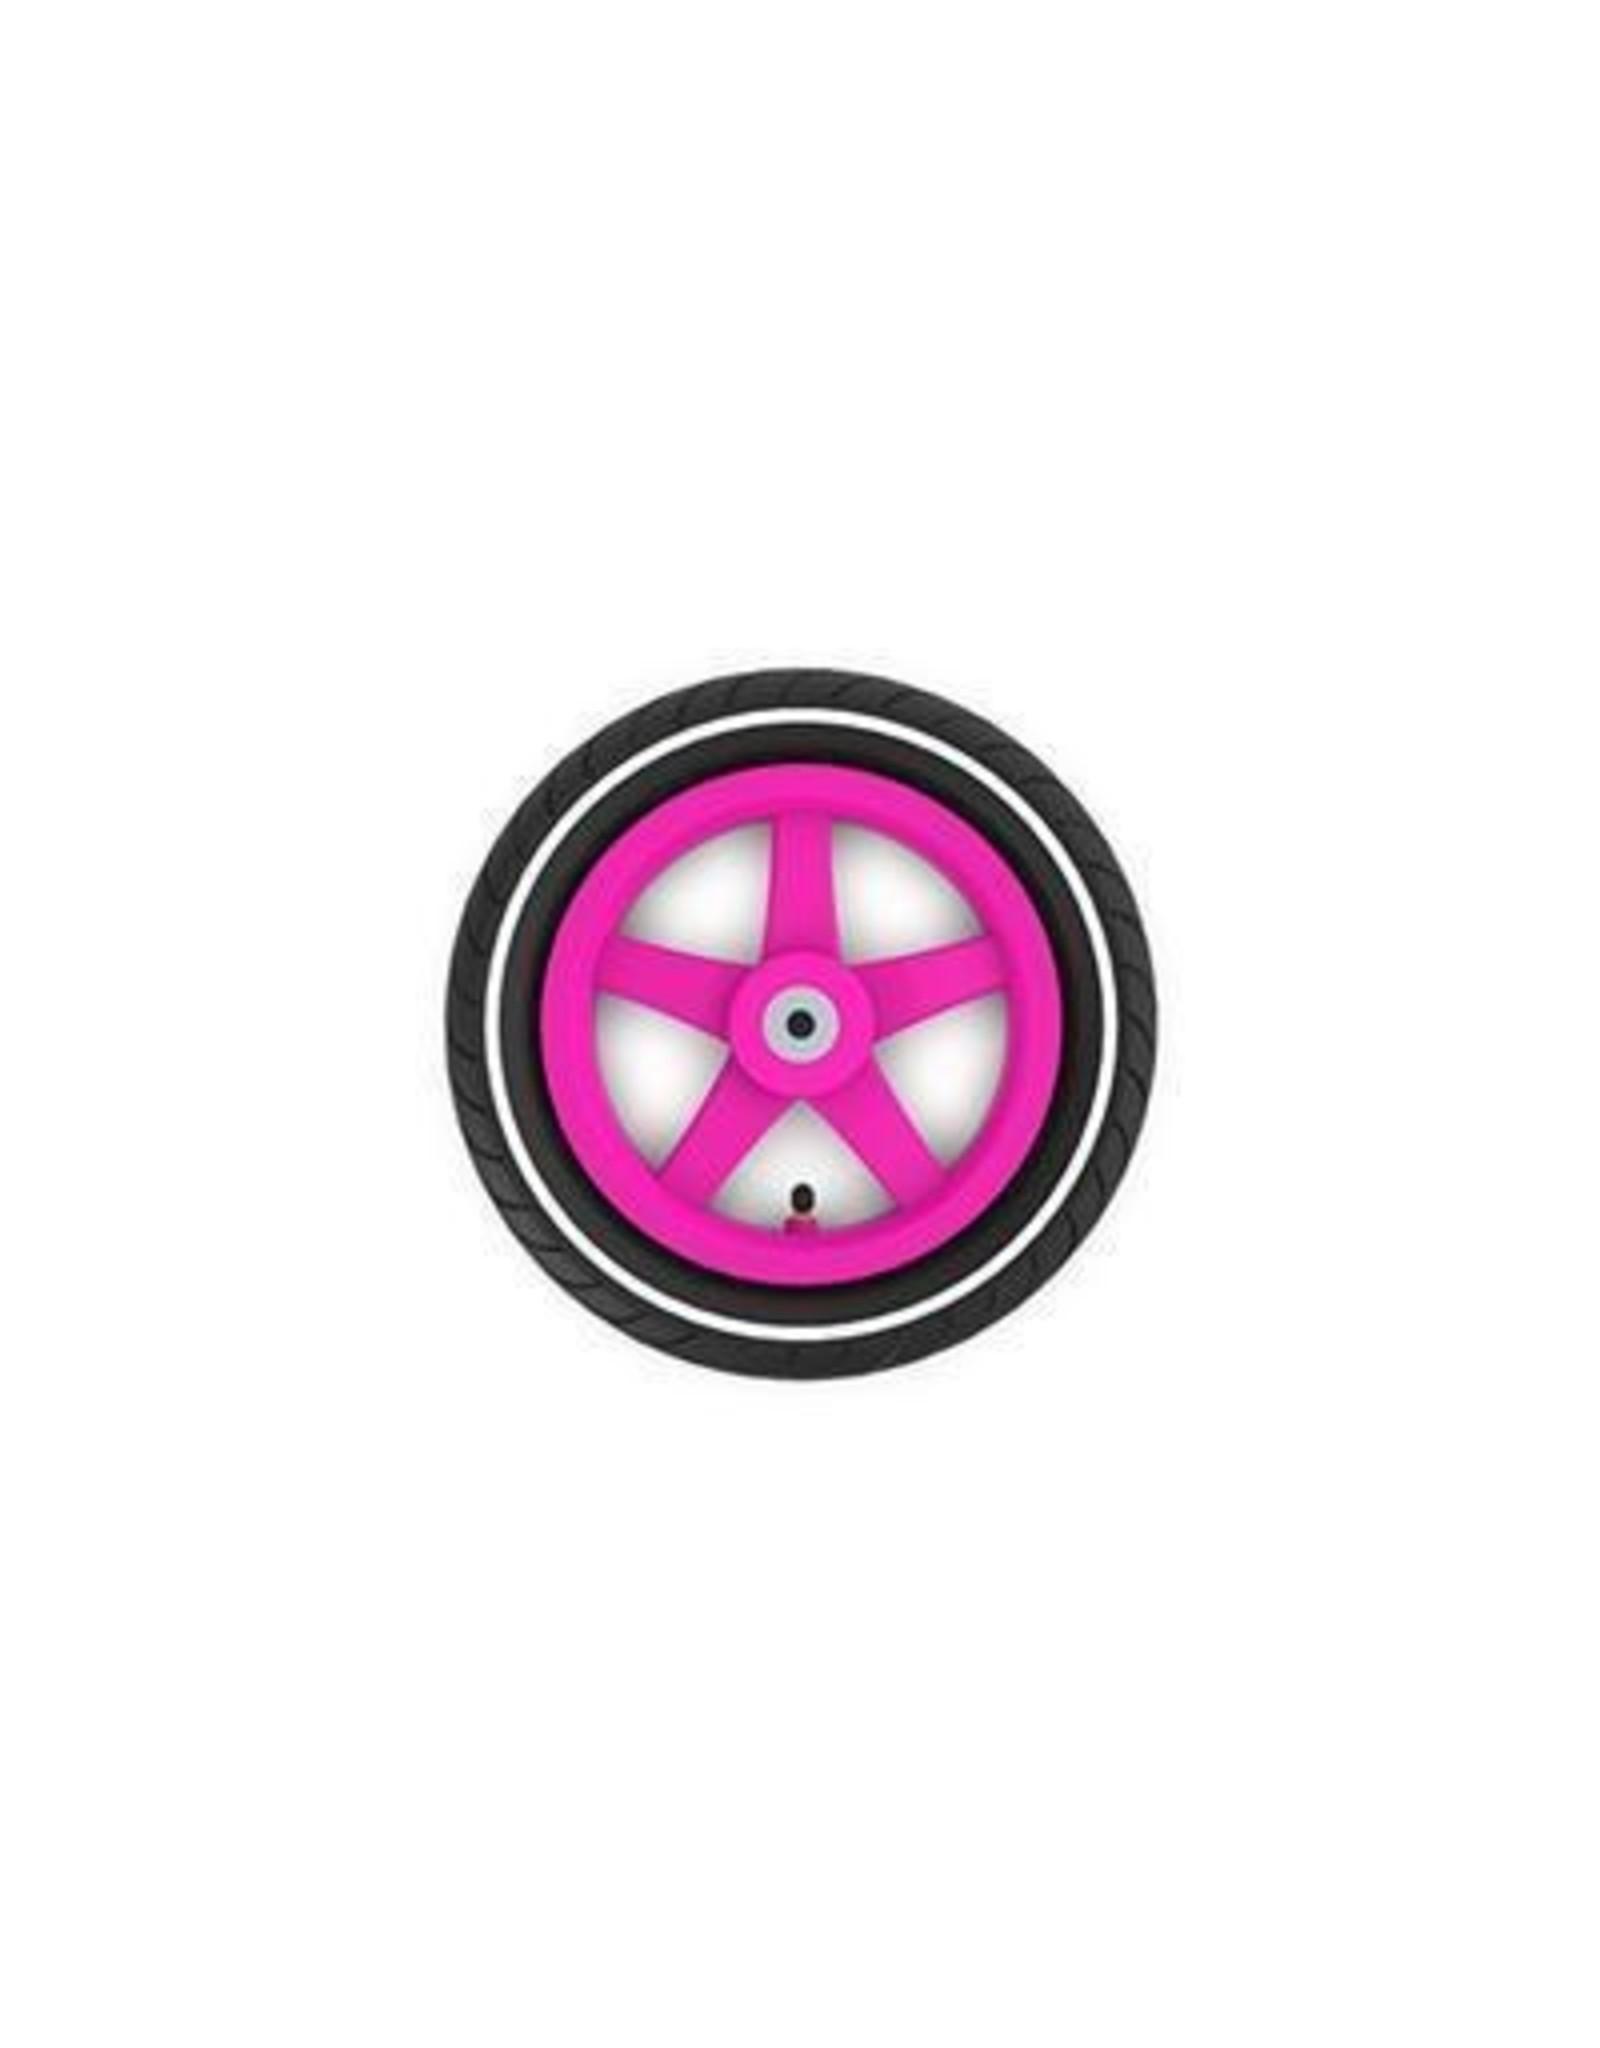 BERG BERG Buddy Rad rosa 12.5x2.25-8 Slick (mit Streifen)